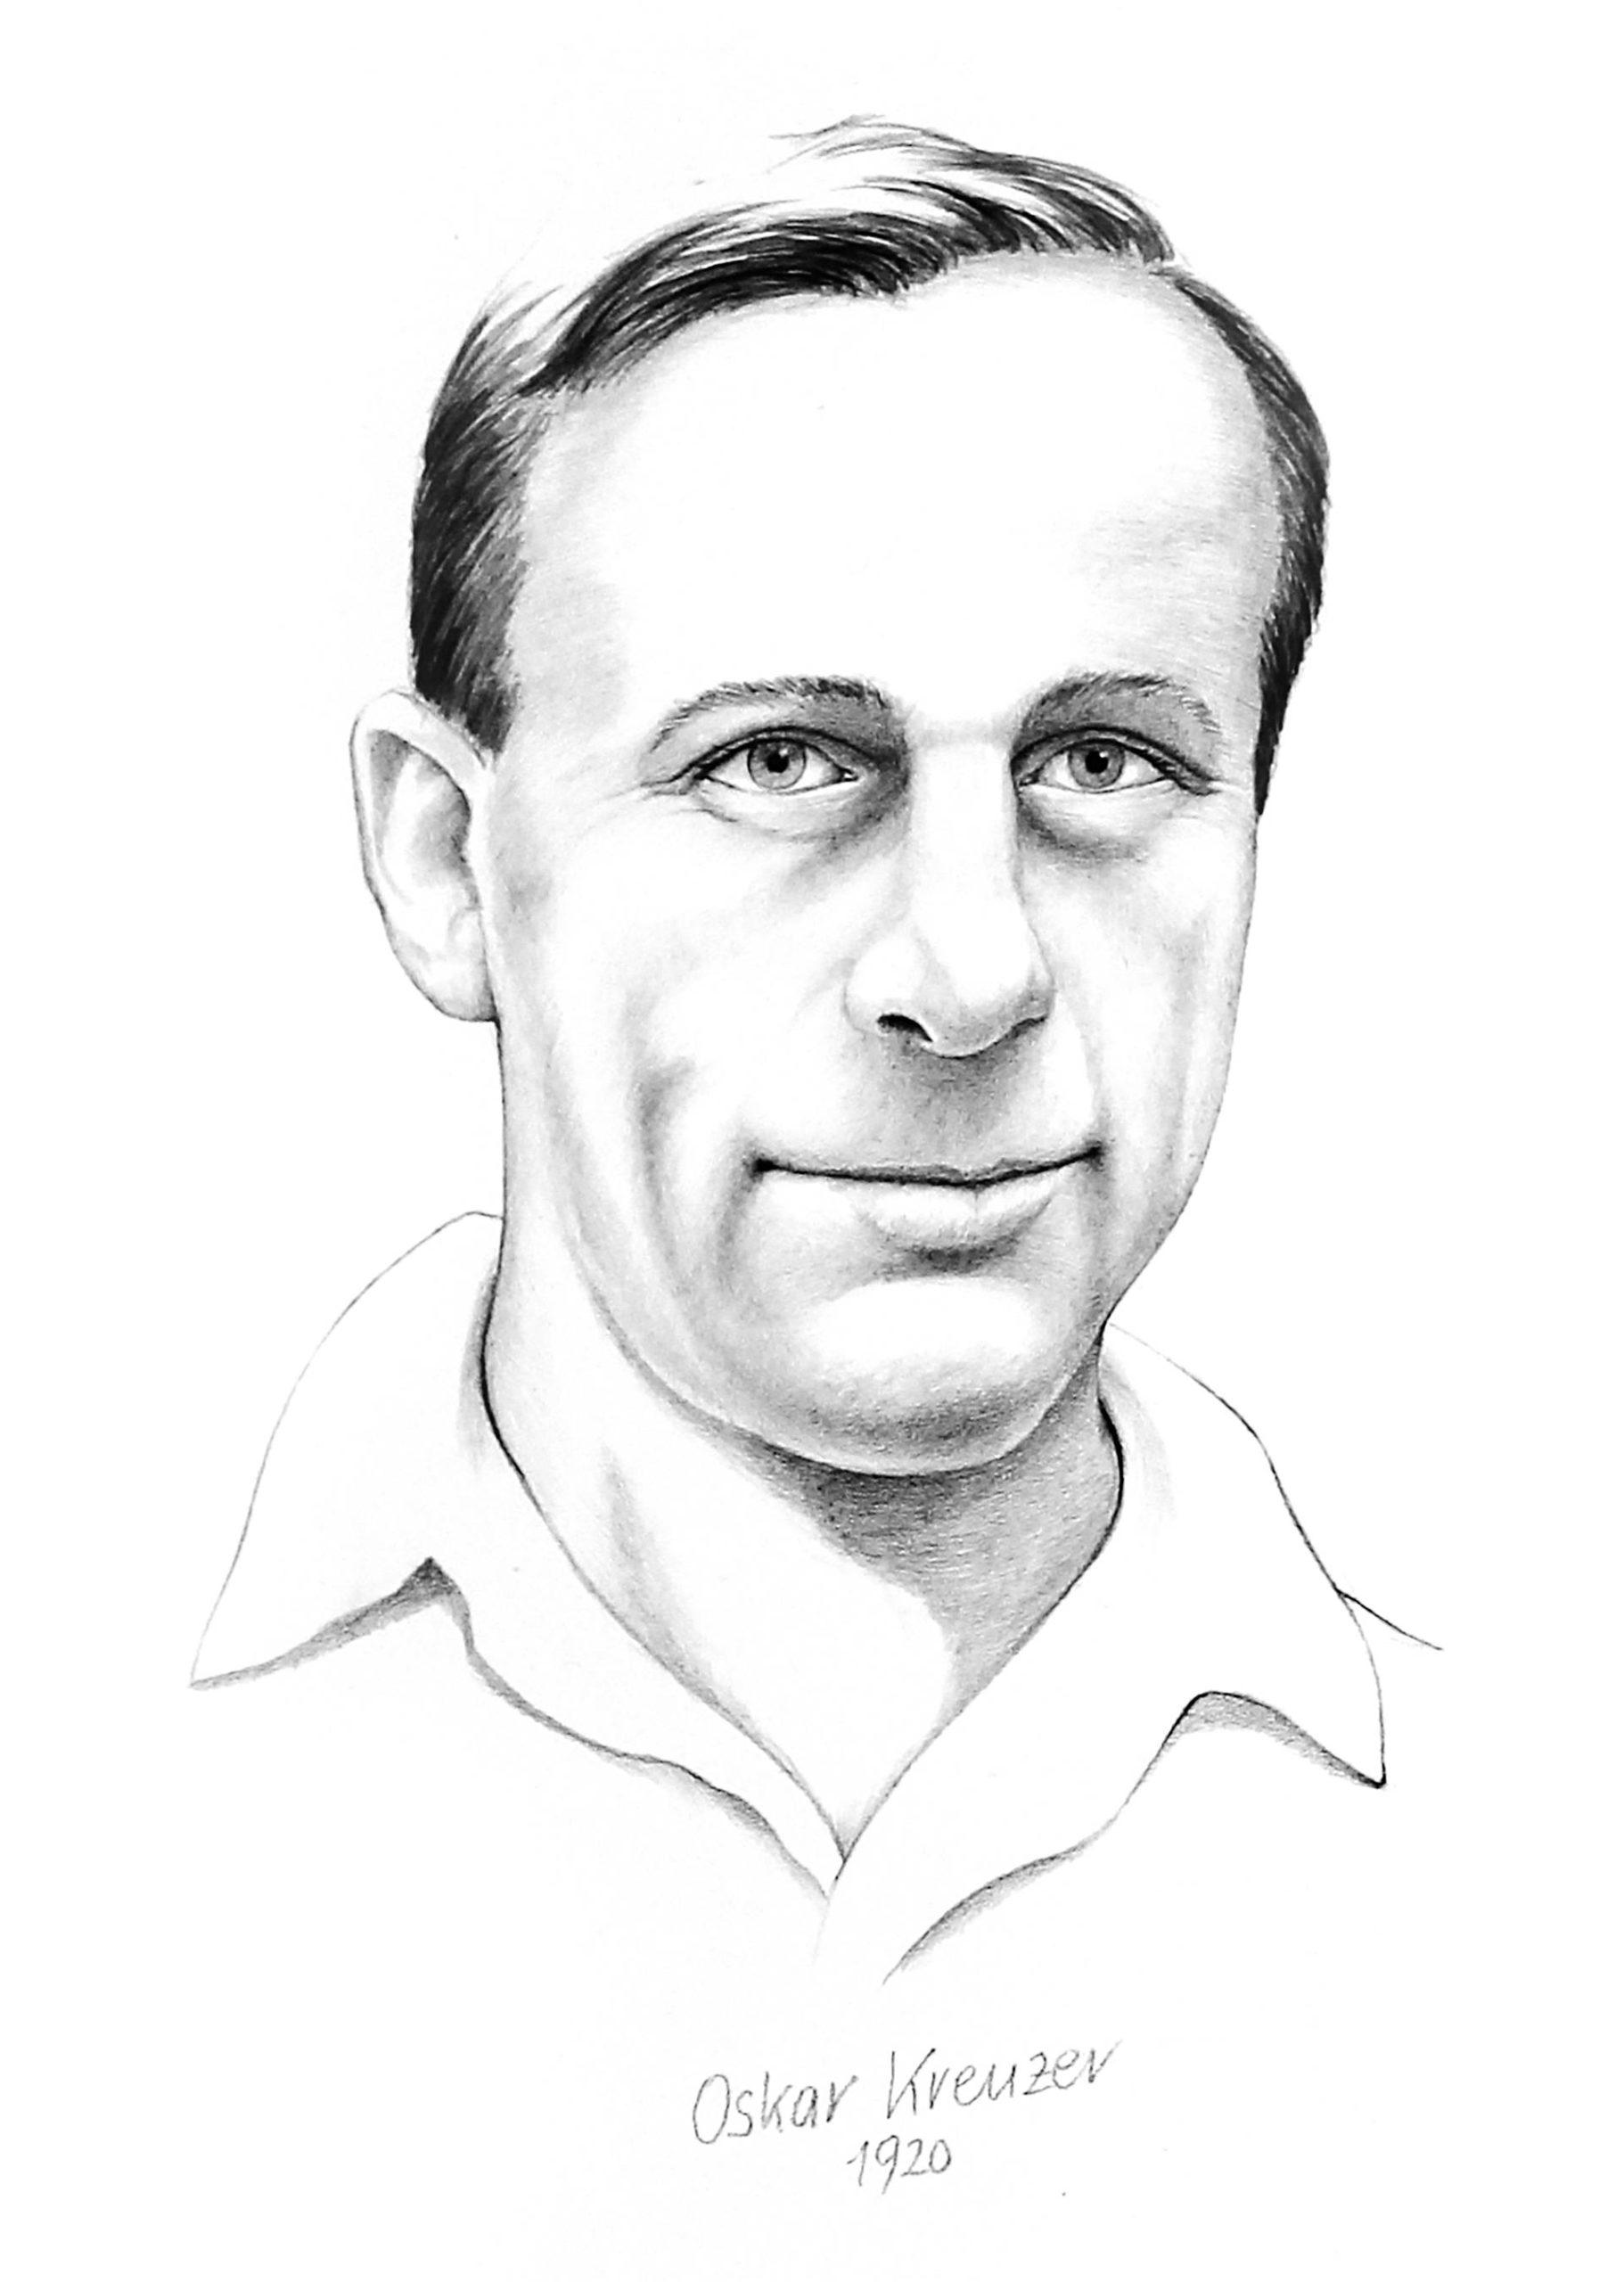 Oscar Kreuzer